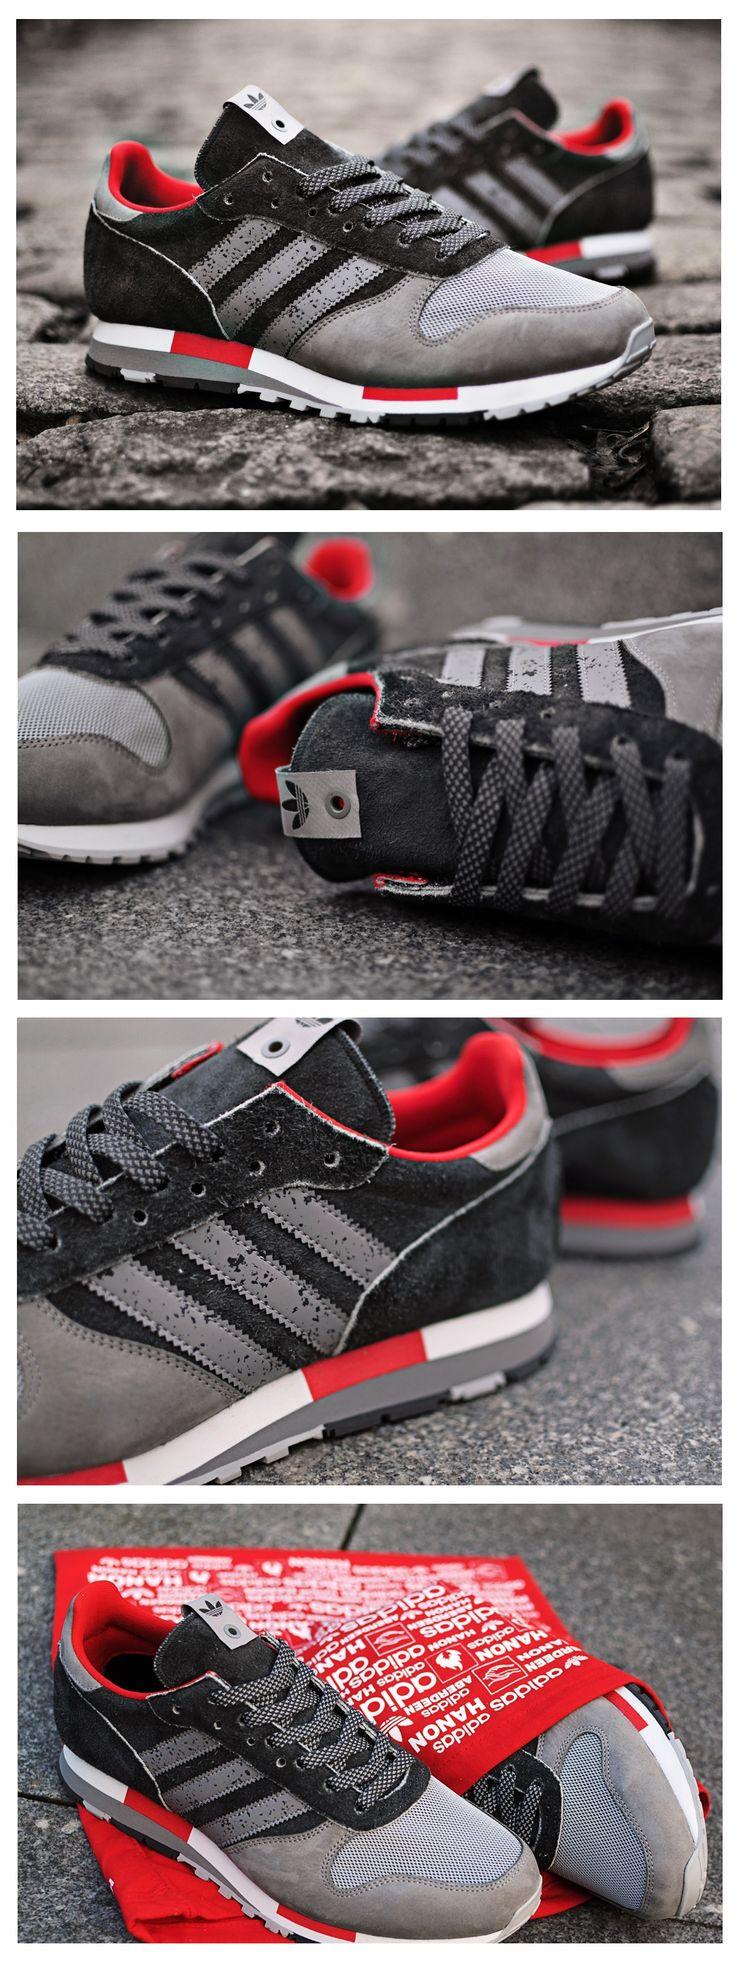 Hanon x adidas Consortium CNTR 'Granite' loves Reshoevn8r